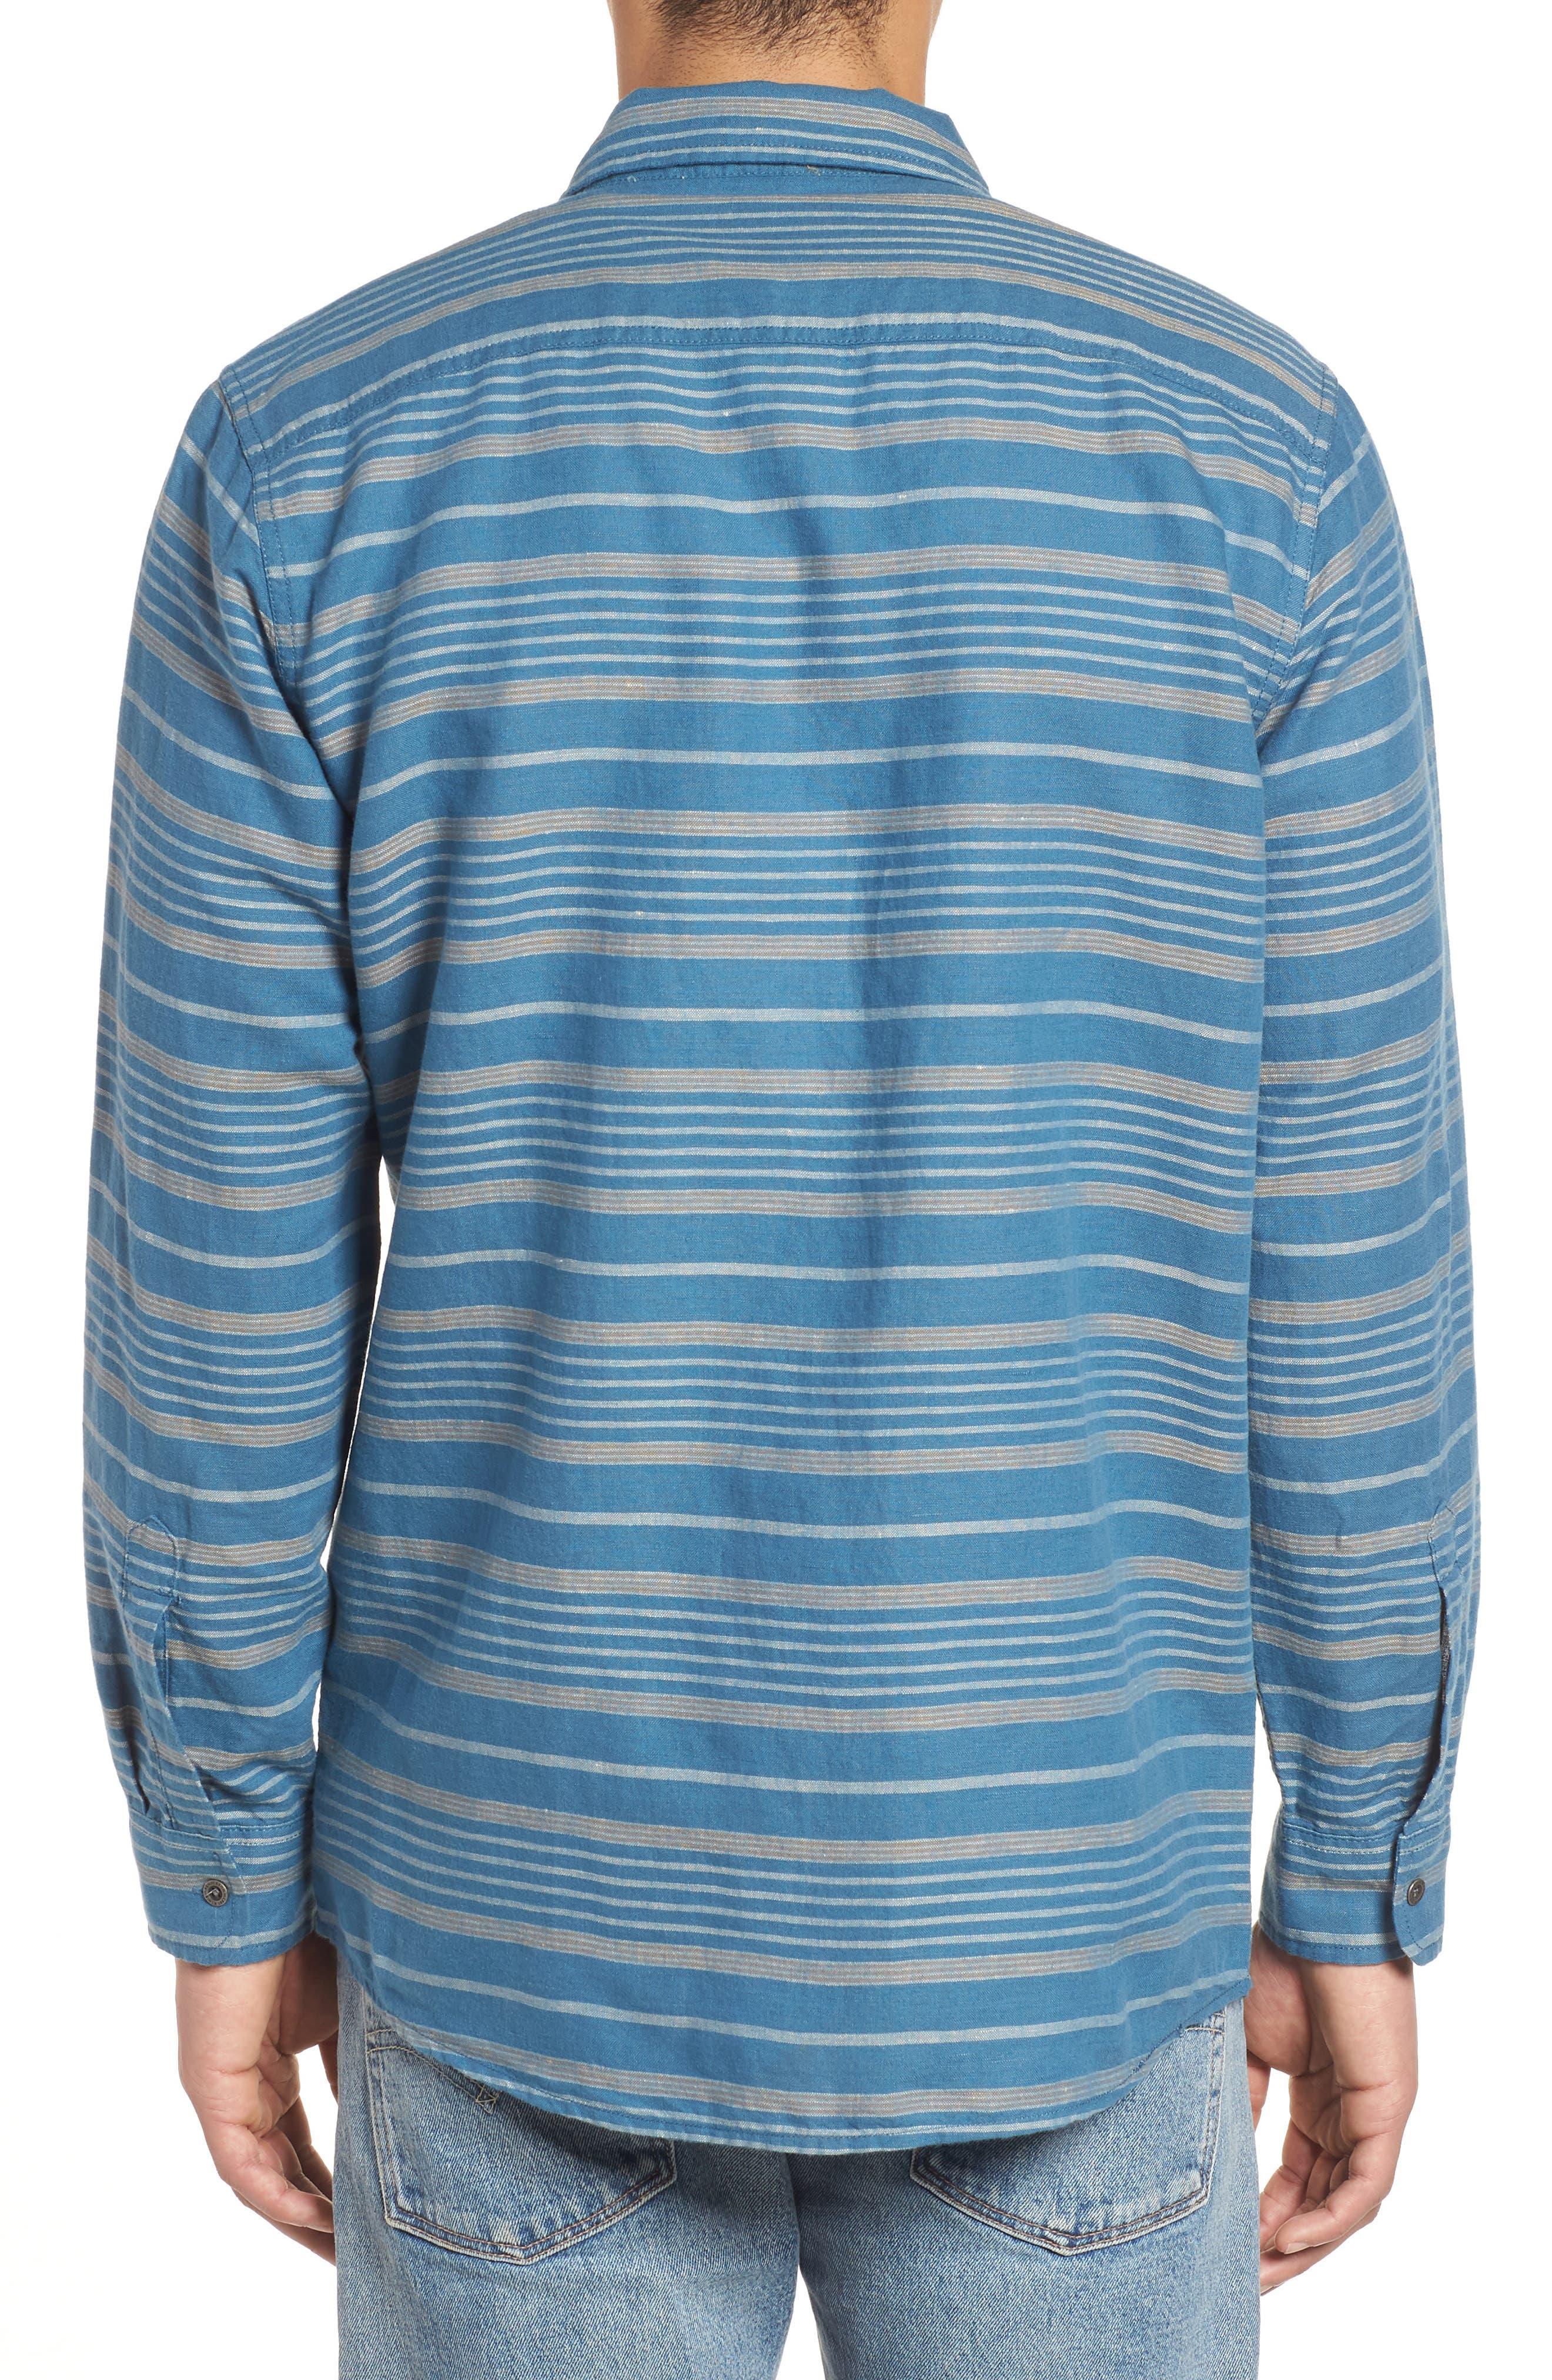 Kay Street Fitted Shirt,                             Alternate thumbnail 2, color,                             Navy/ Cream Stripe